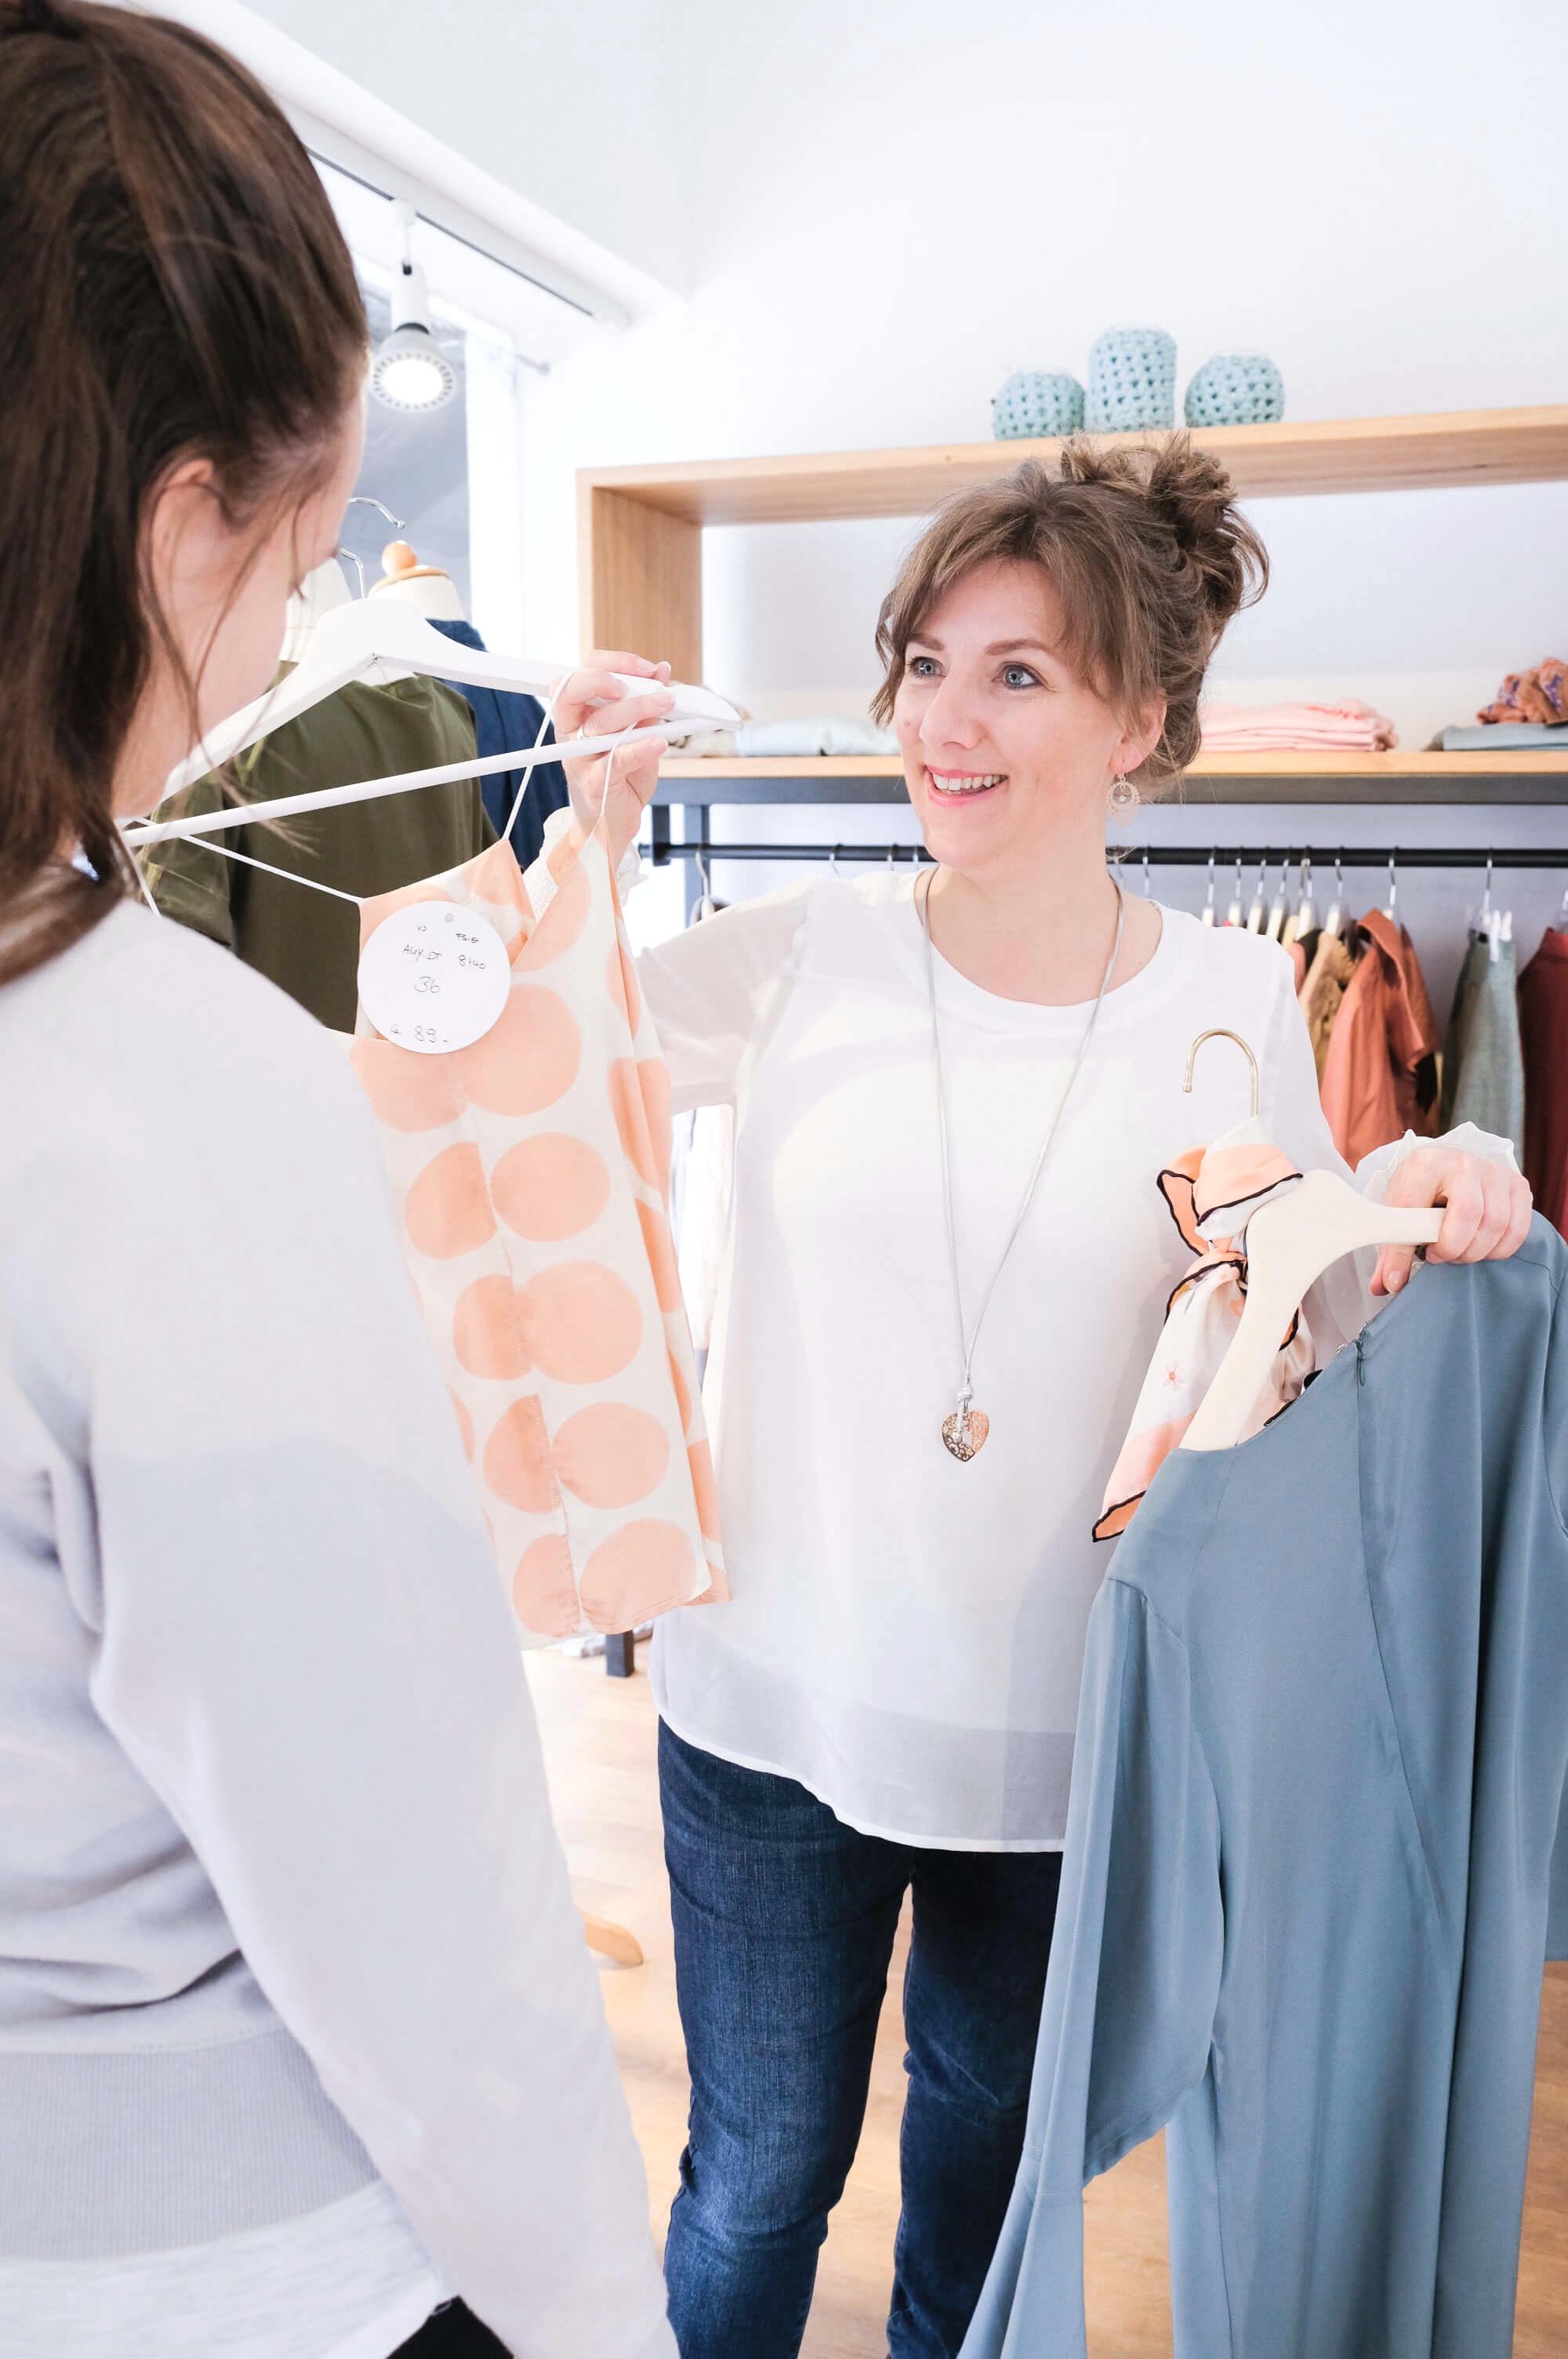 Nicole-Didier-Personal-Shopping.jpg